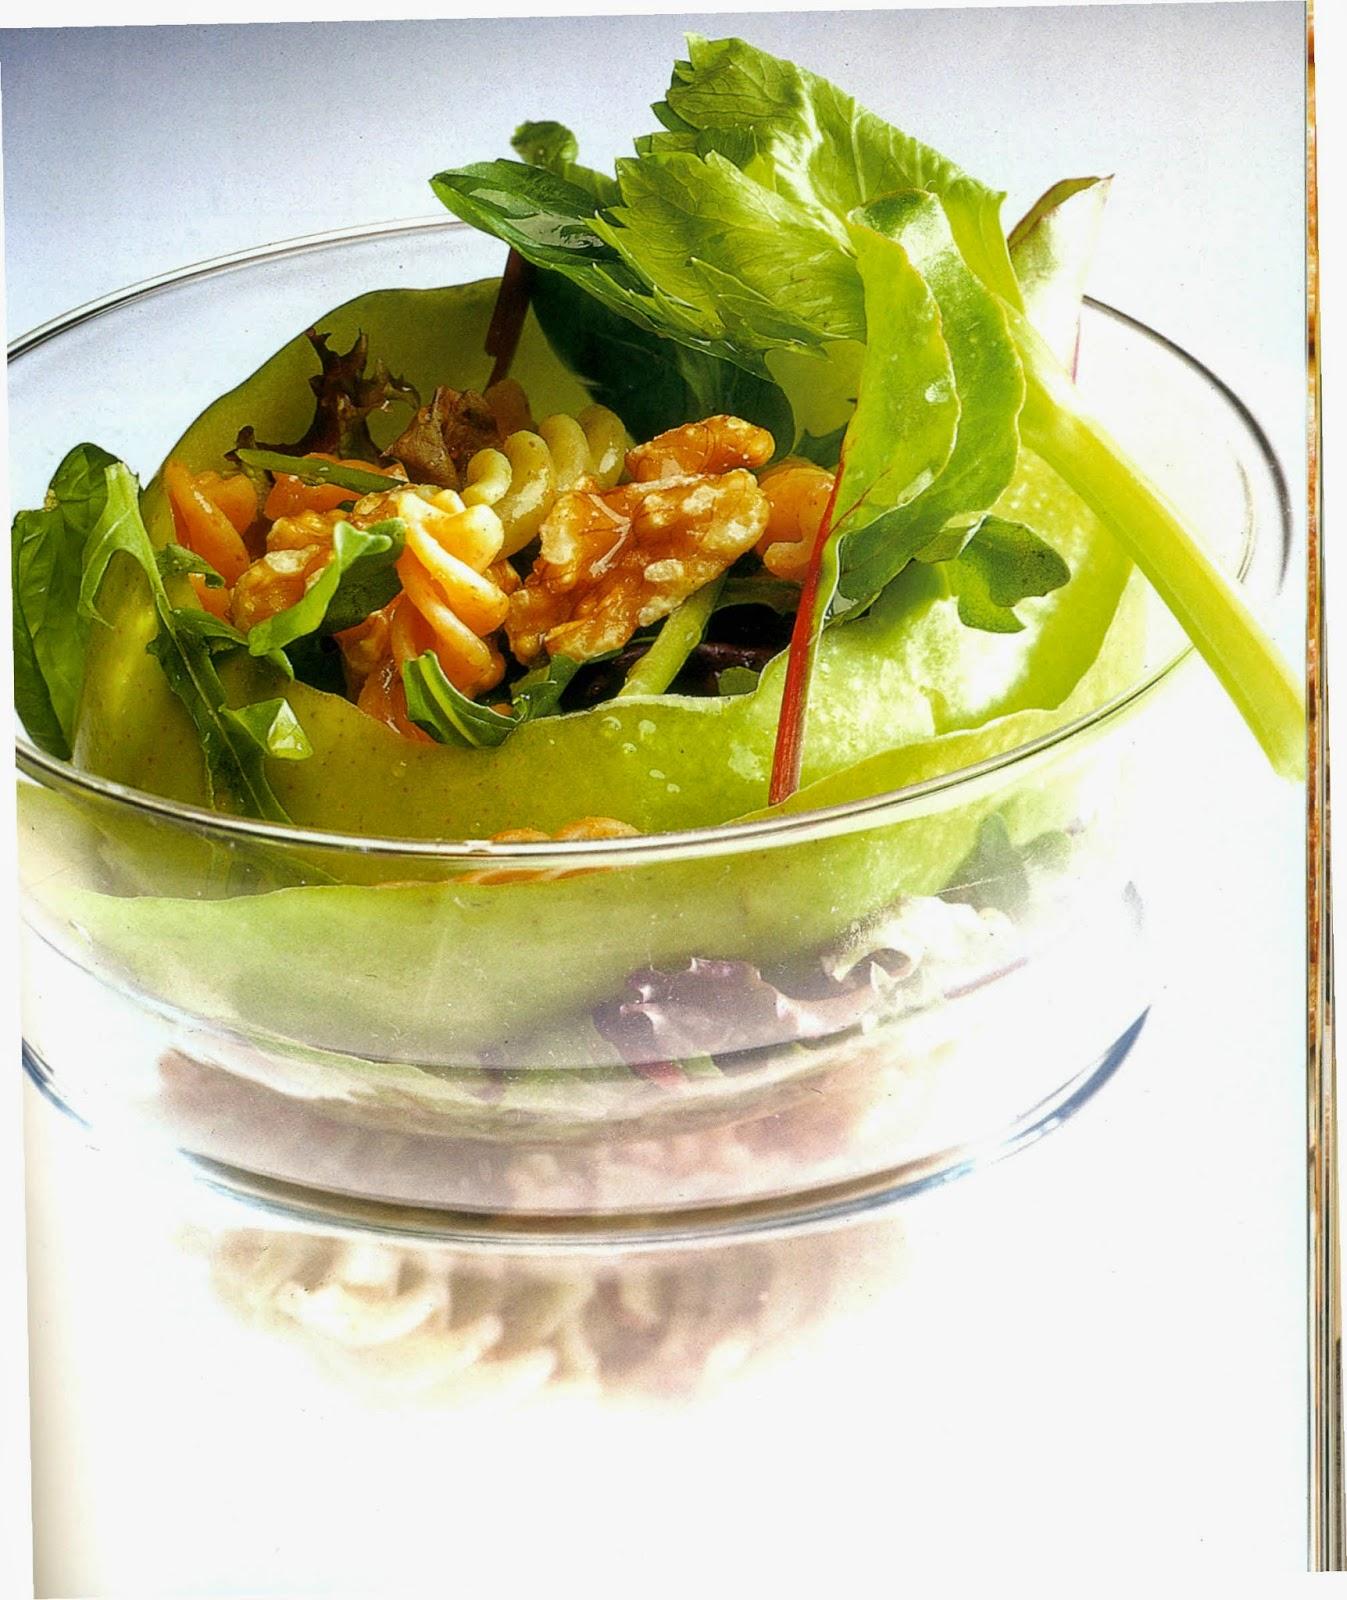 Elisabet thermomix ensalada de pasta integral for Ensalada de pasta integral